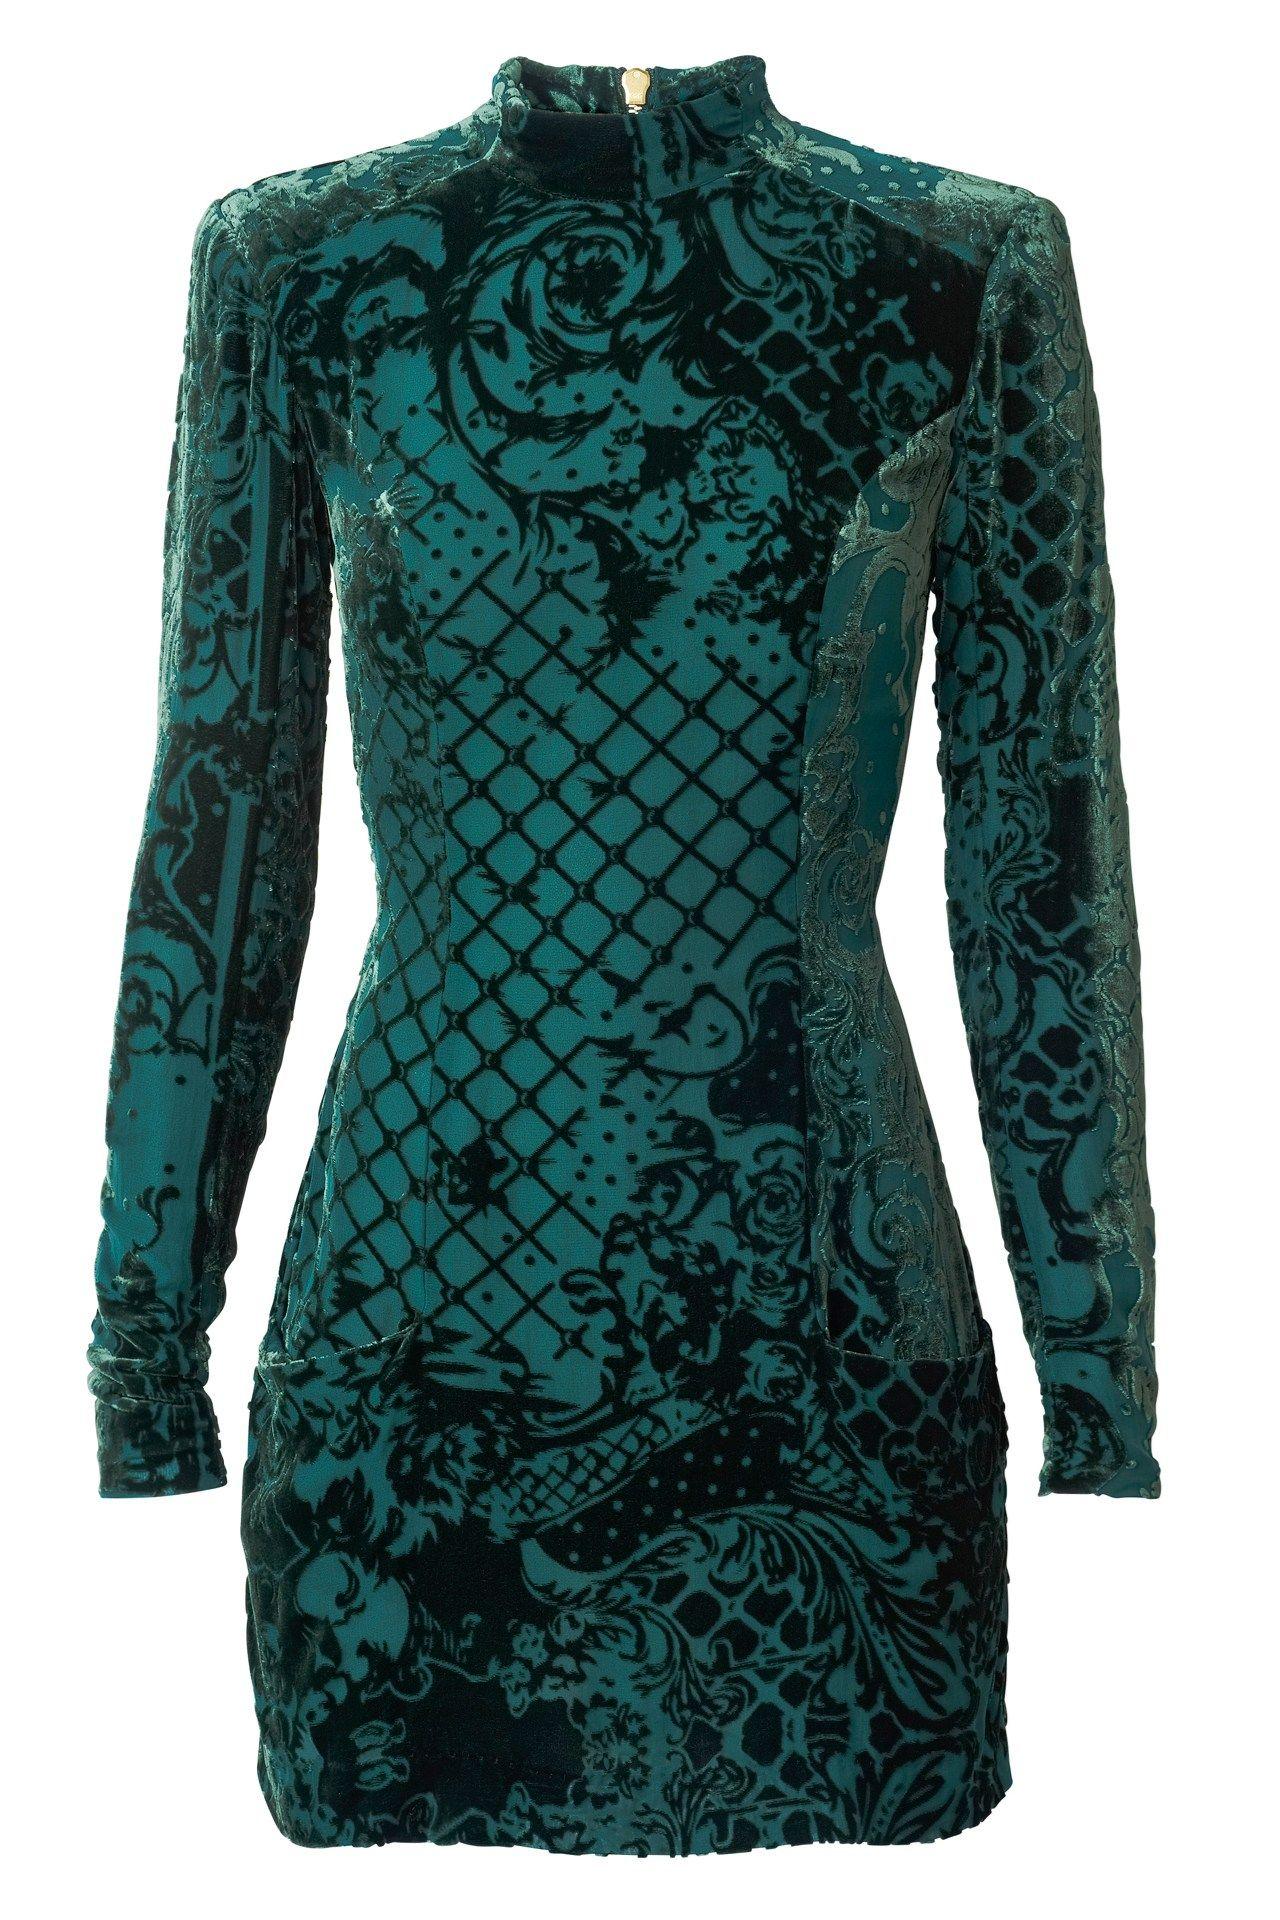 c77f37f34fab H&M + Balmain grön mönstrad klänning Green Dress, Green Velvet Dress,  Green